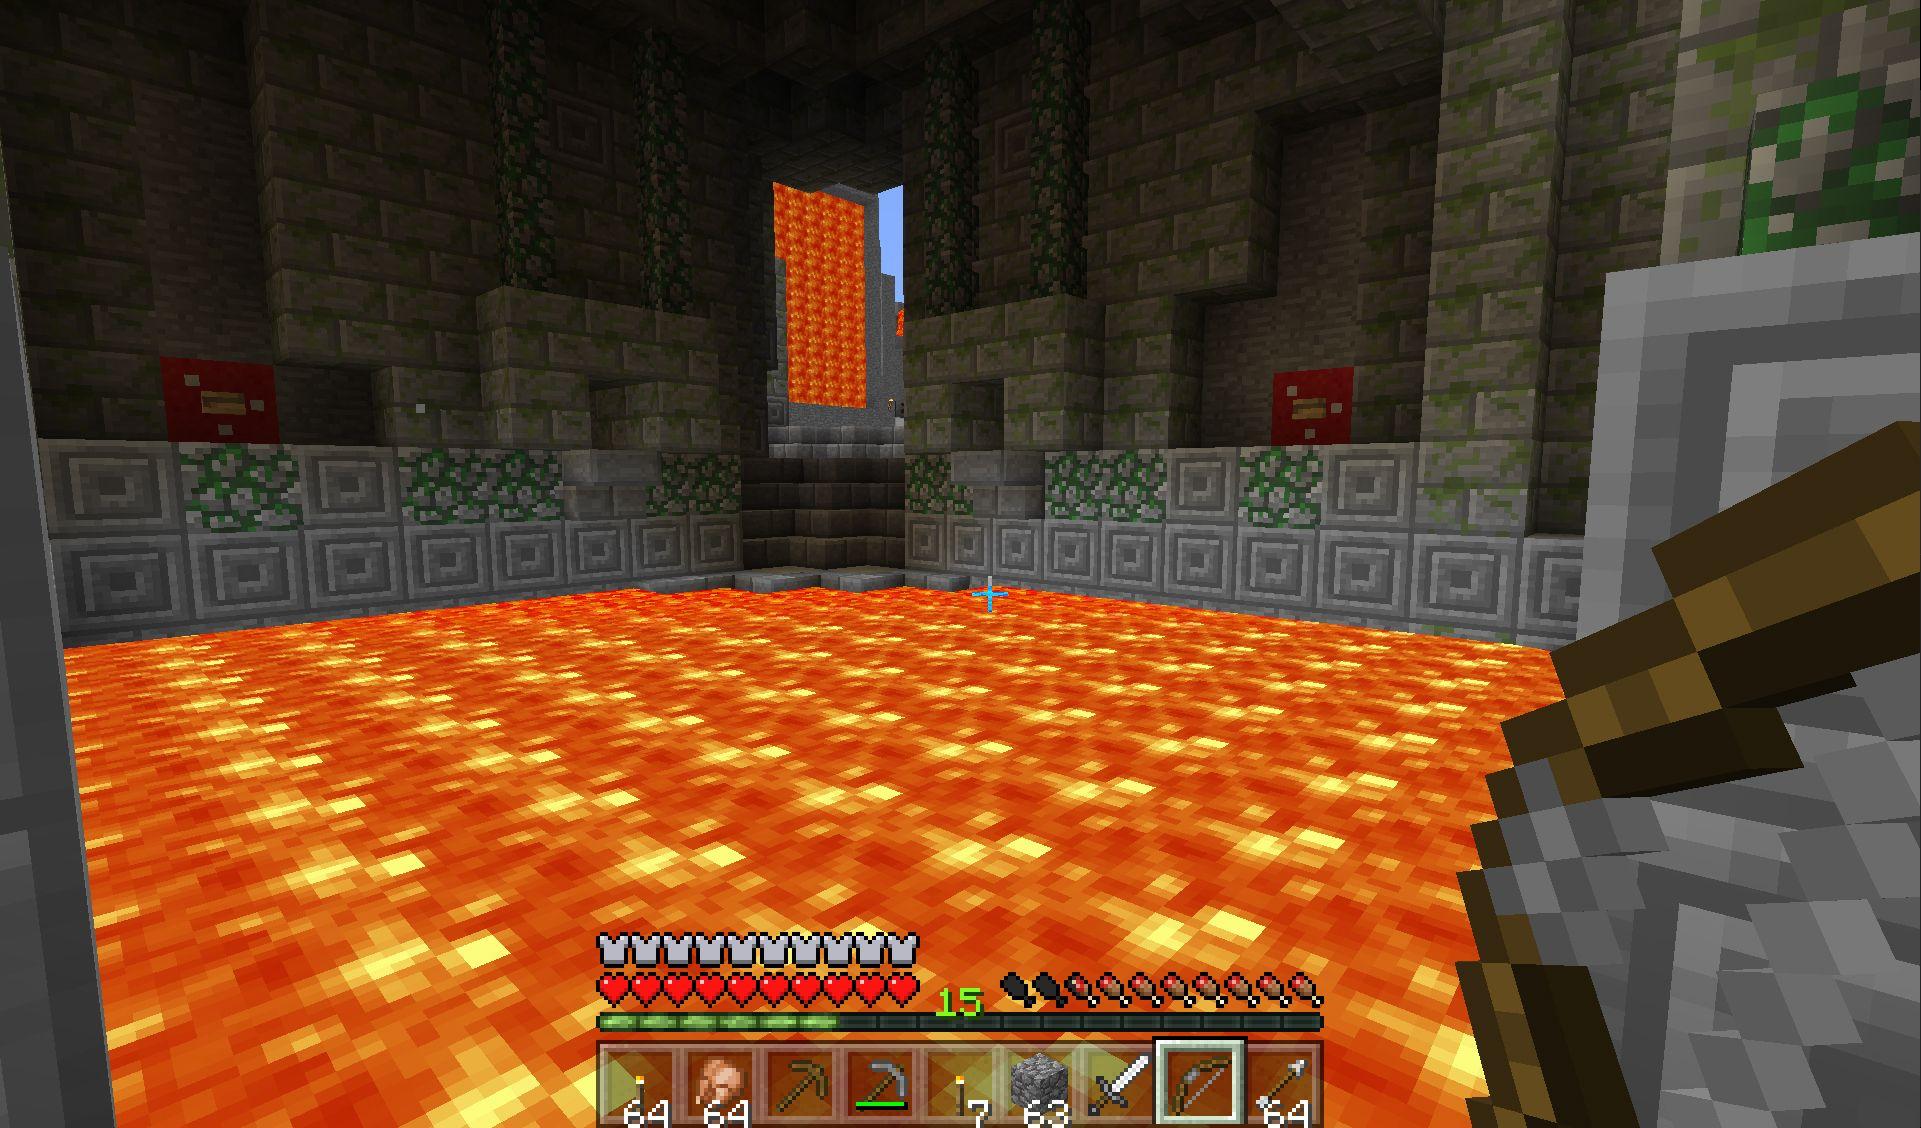 Minecraft: Oculus Rift Edition